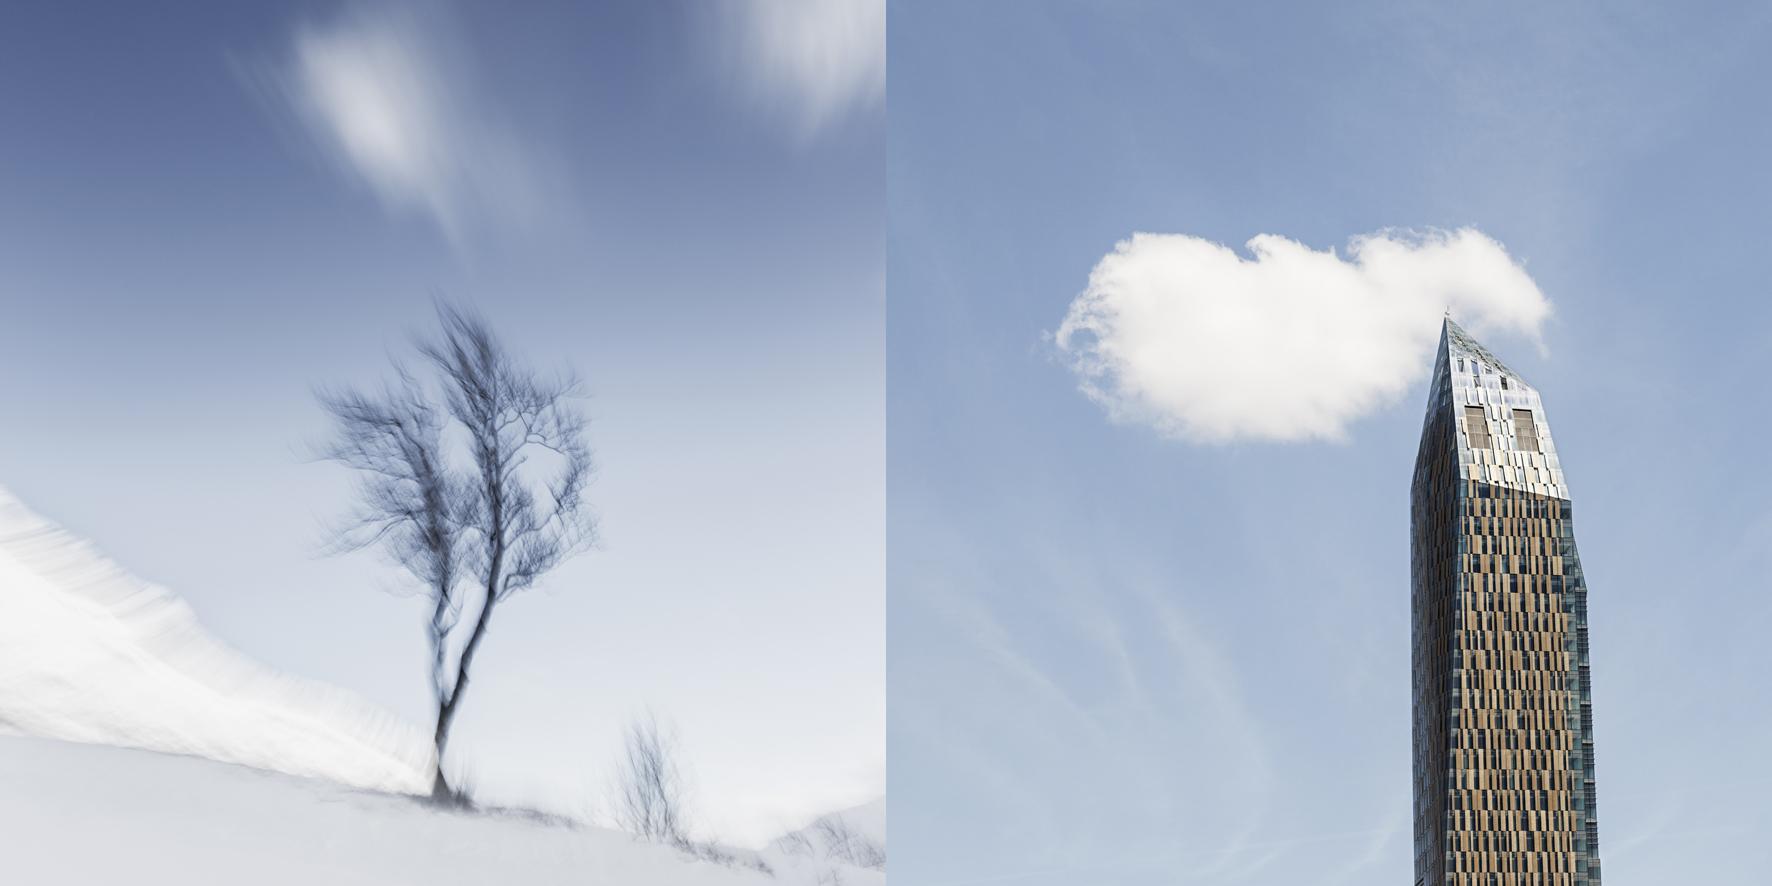 Nébula - Como dos gotas de poesía   - Como dos gotas de poesía, fotografías de LaraBisbe